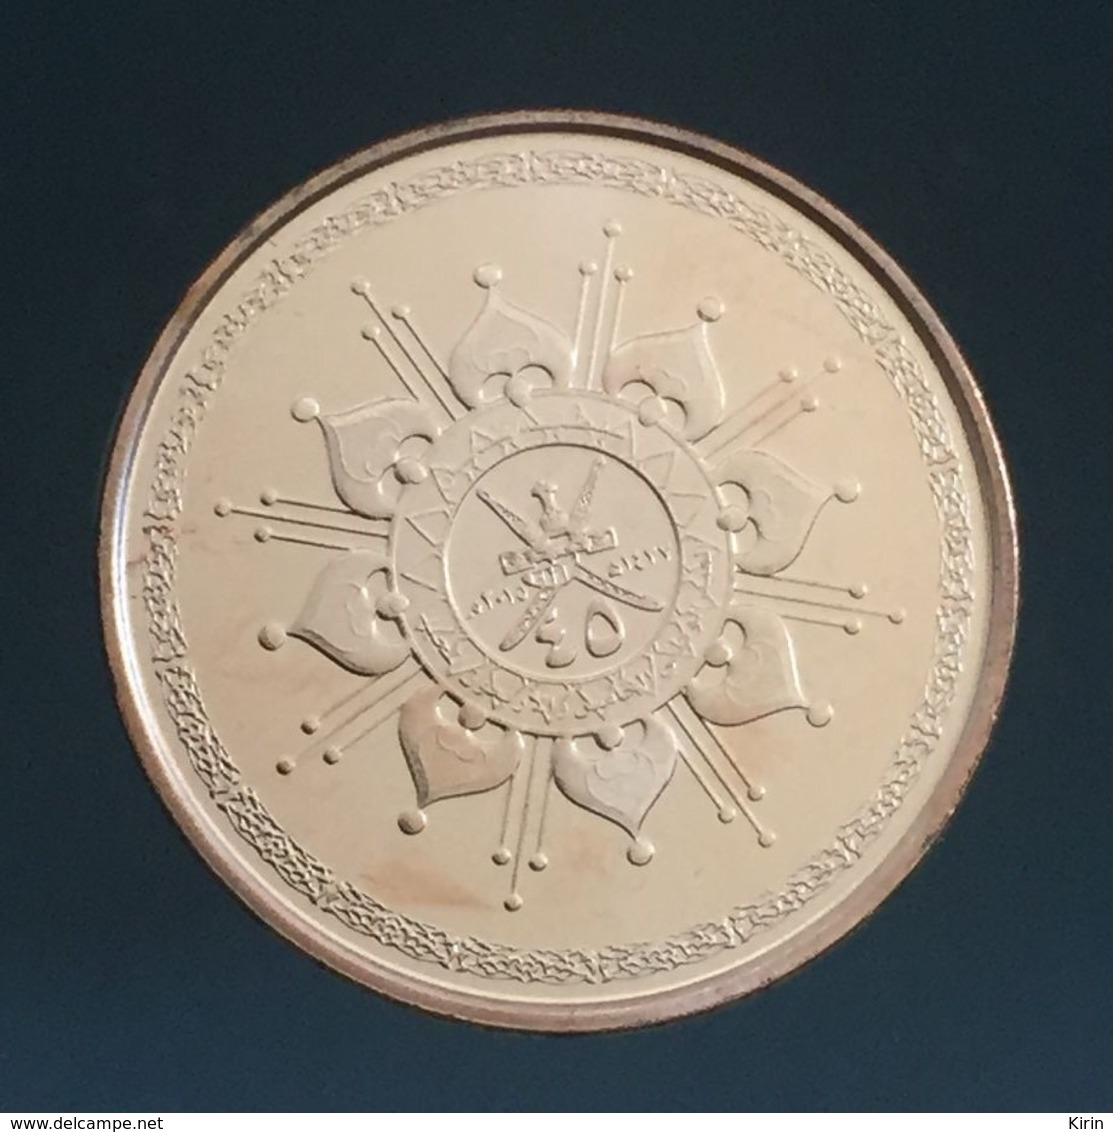 Oman 5 Baisa 2015 45th National Day Commemorative Coin UNC - Omán